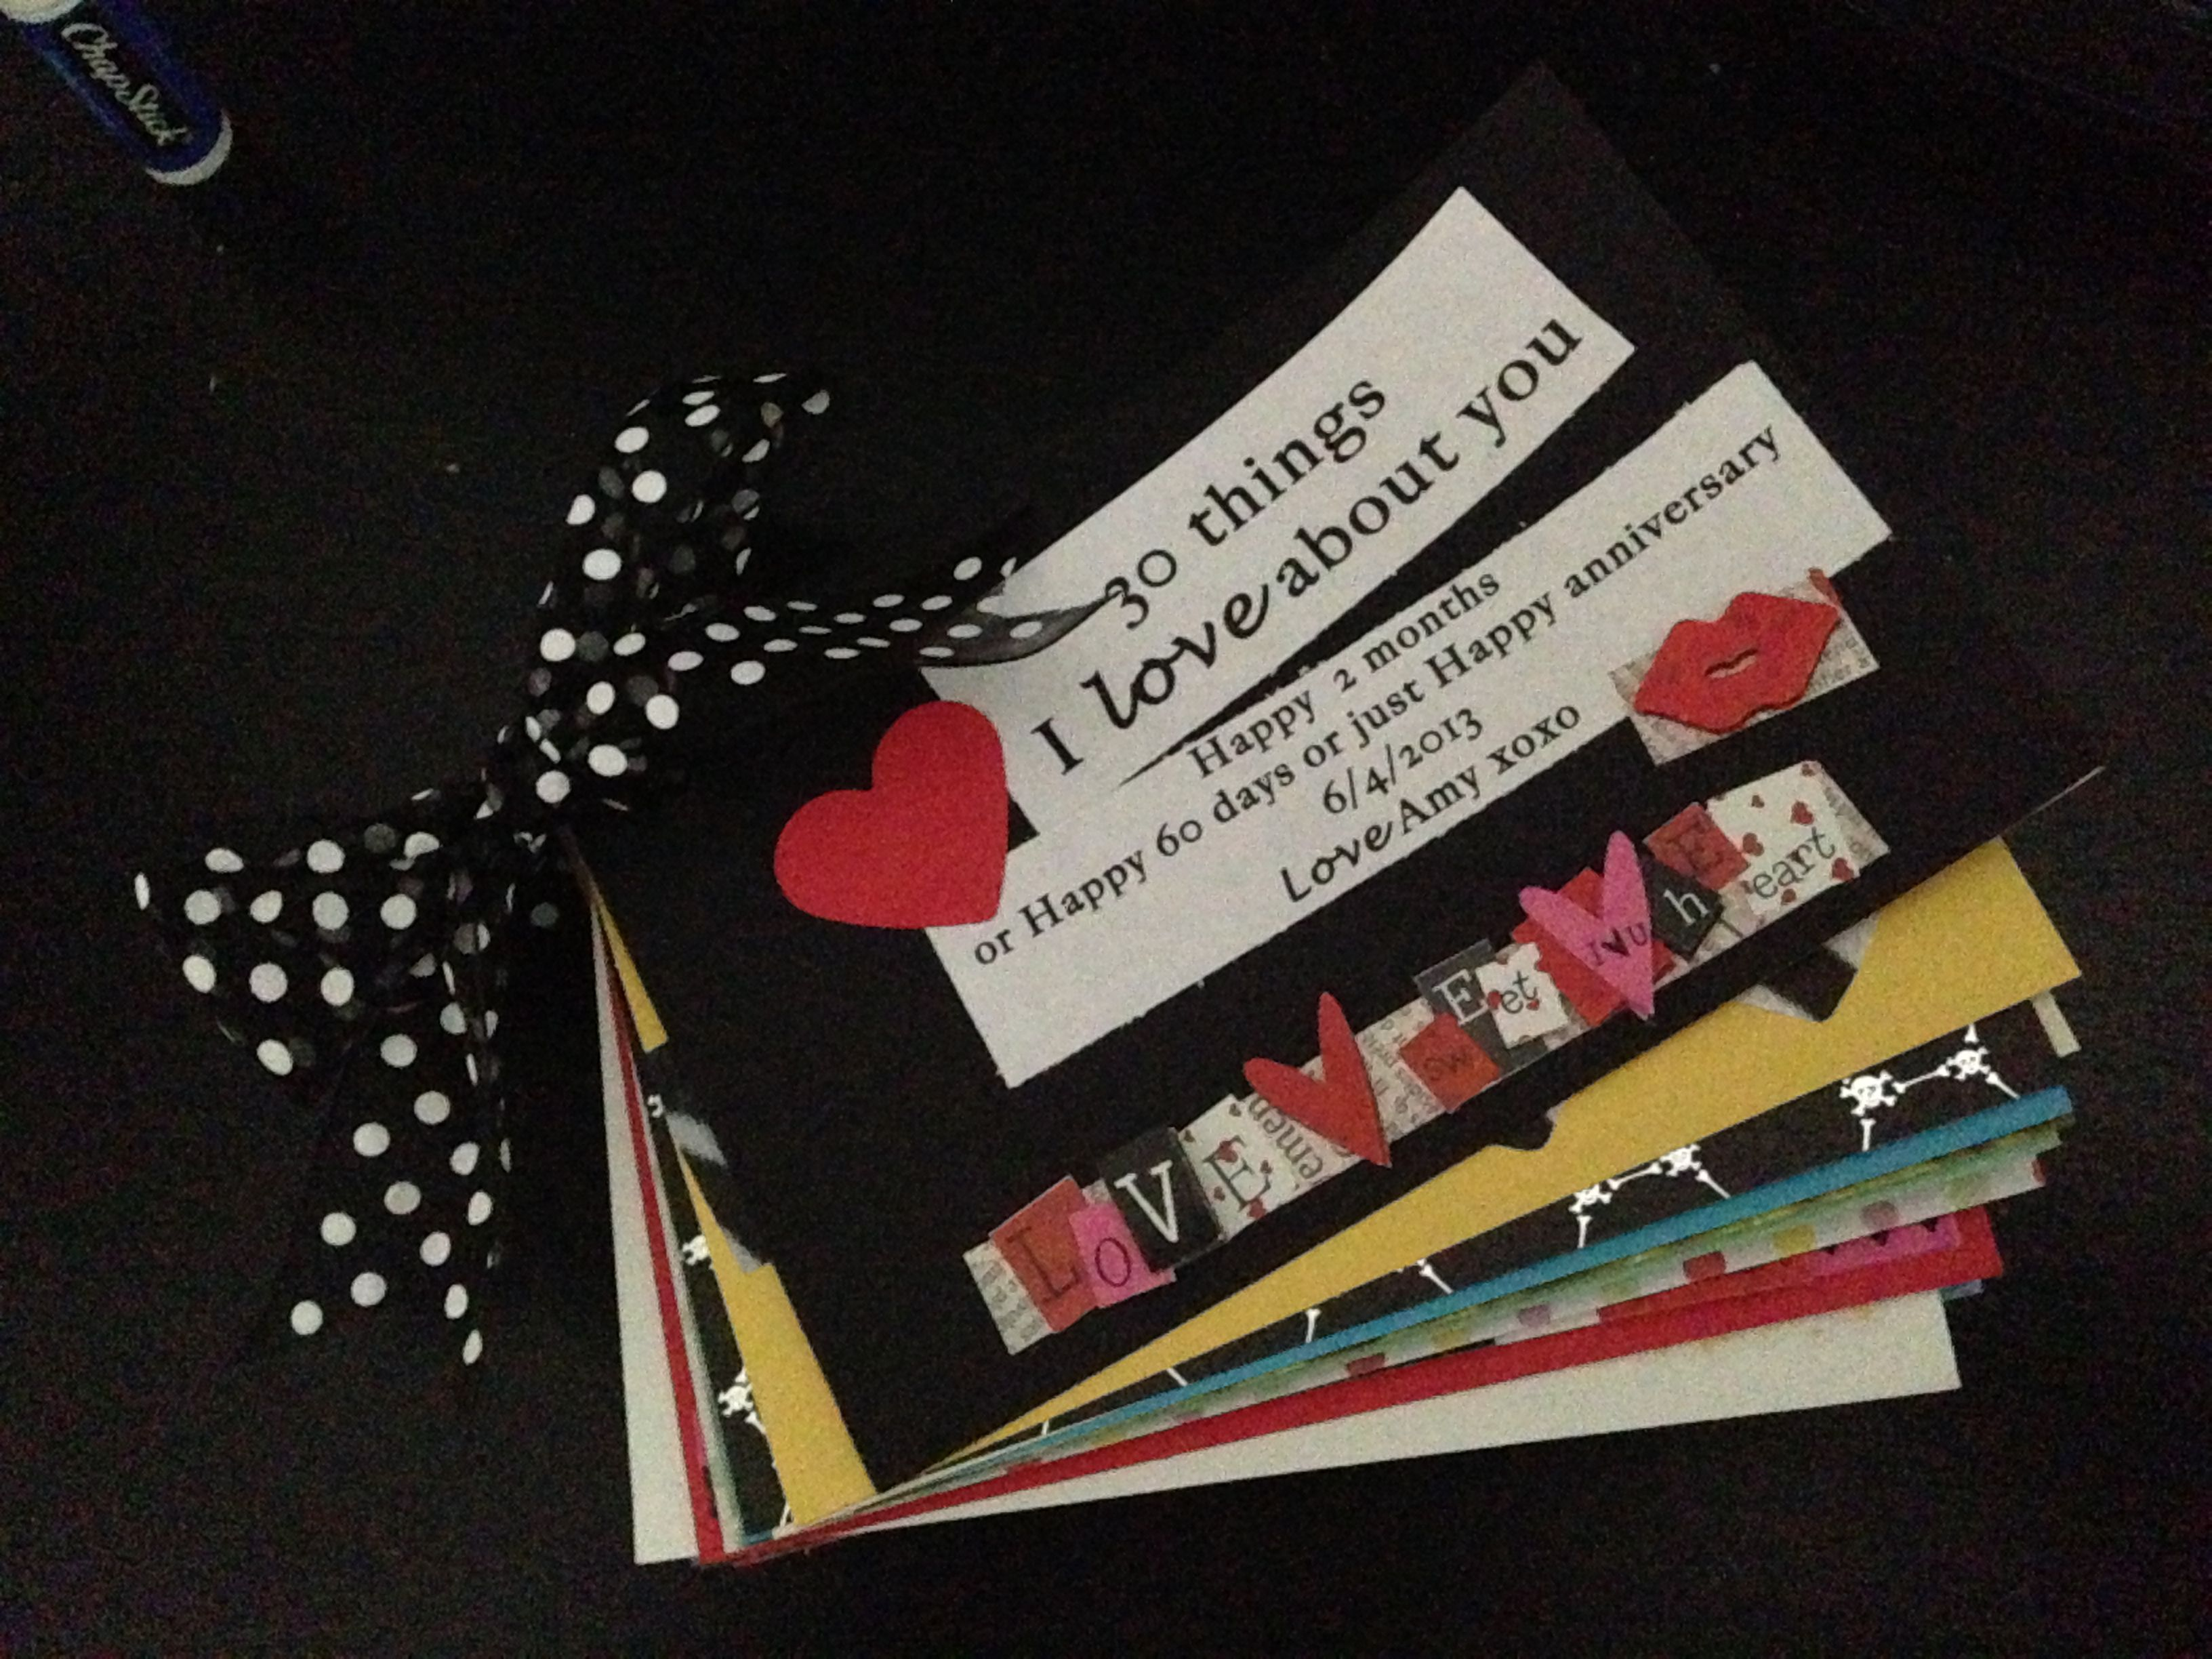 Book I made for my boyfriend #diy #boyfriend #homemadegift #30reasonsiloveyou